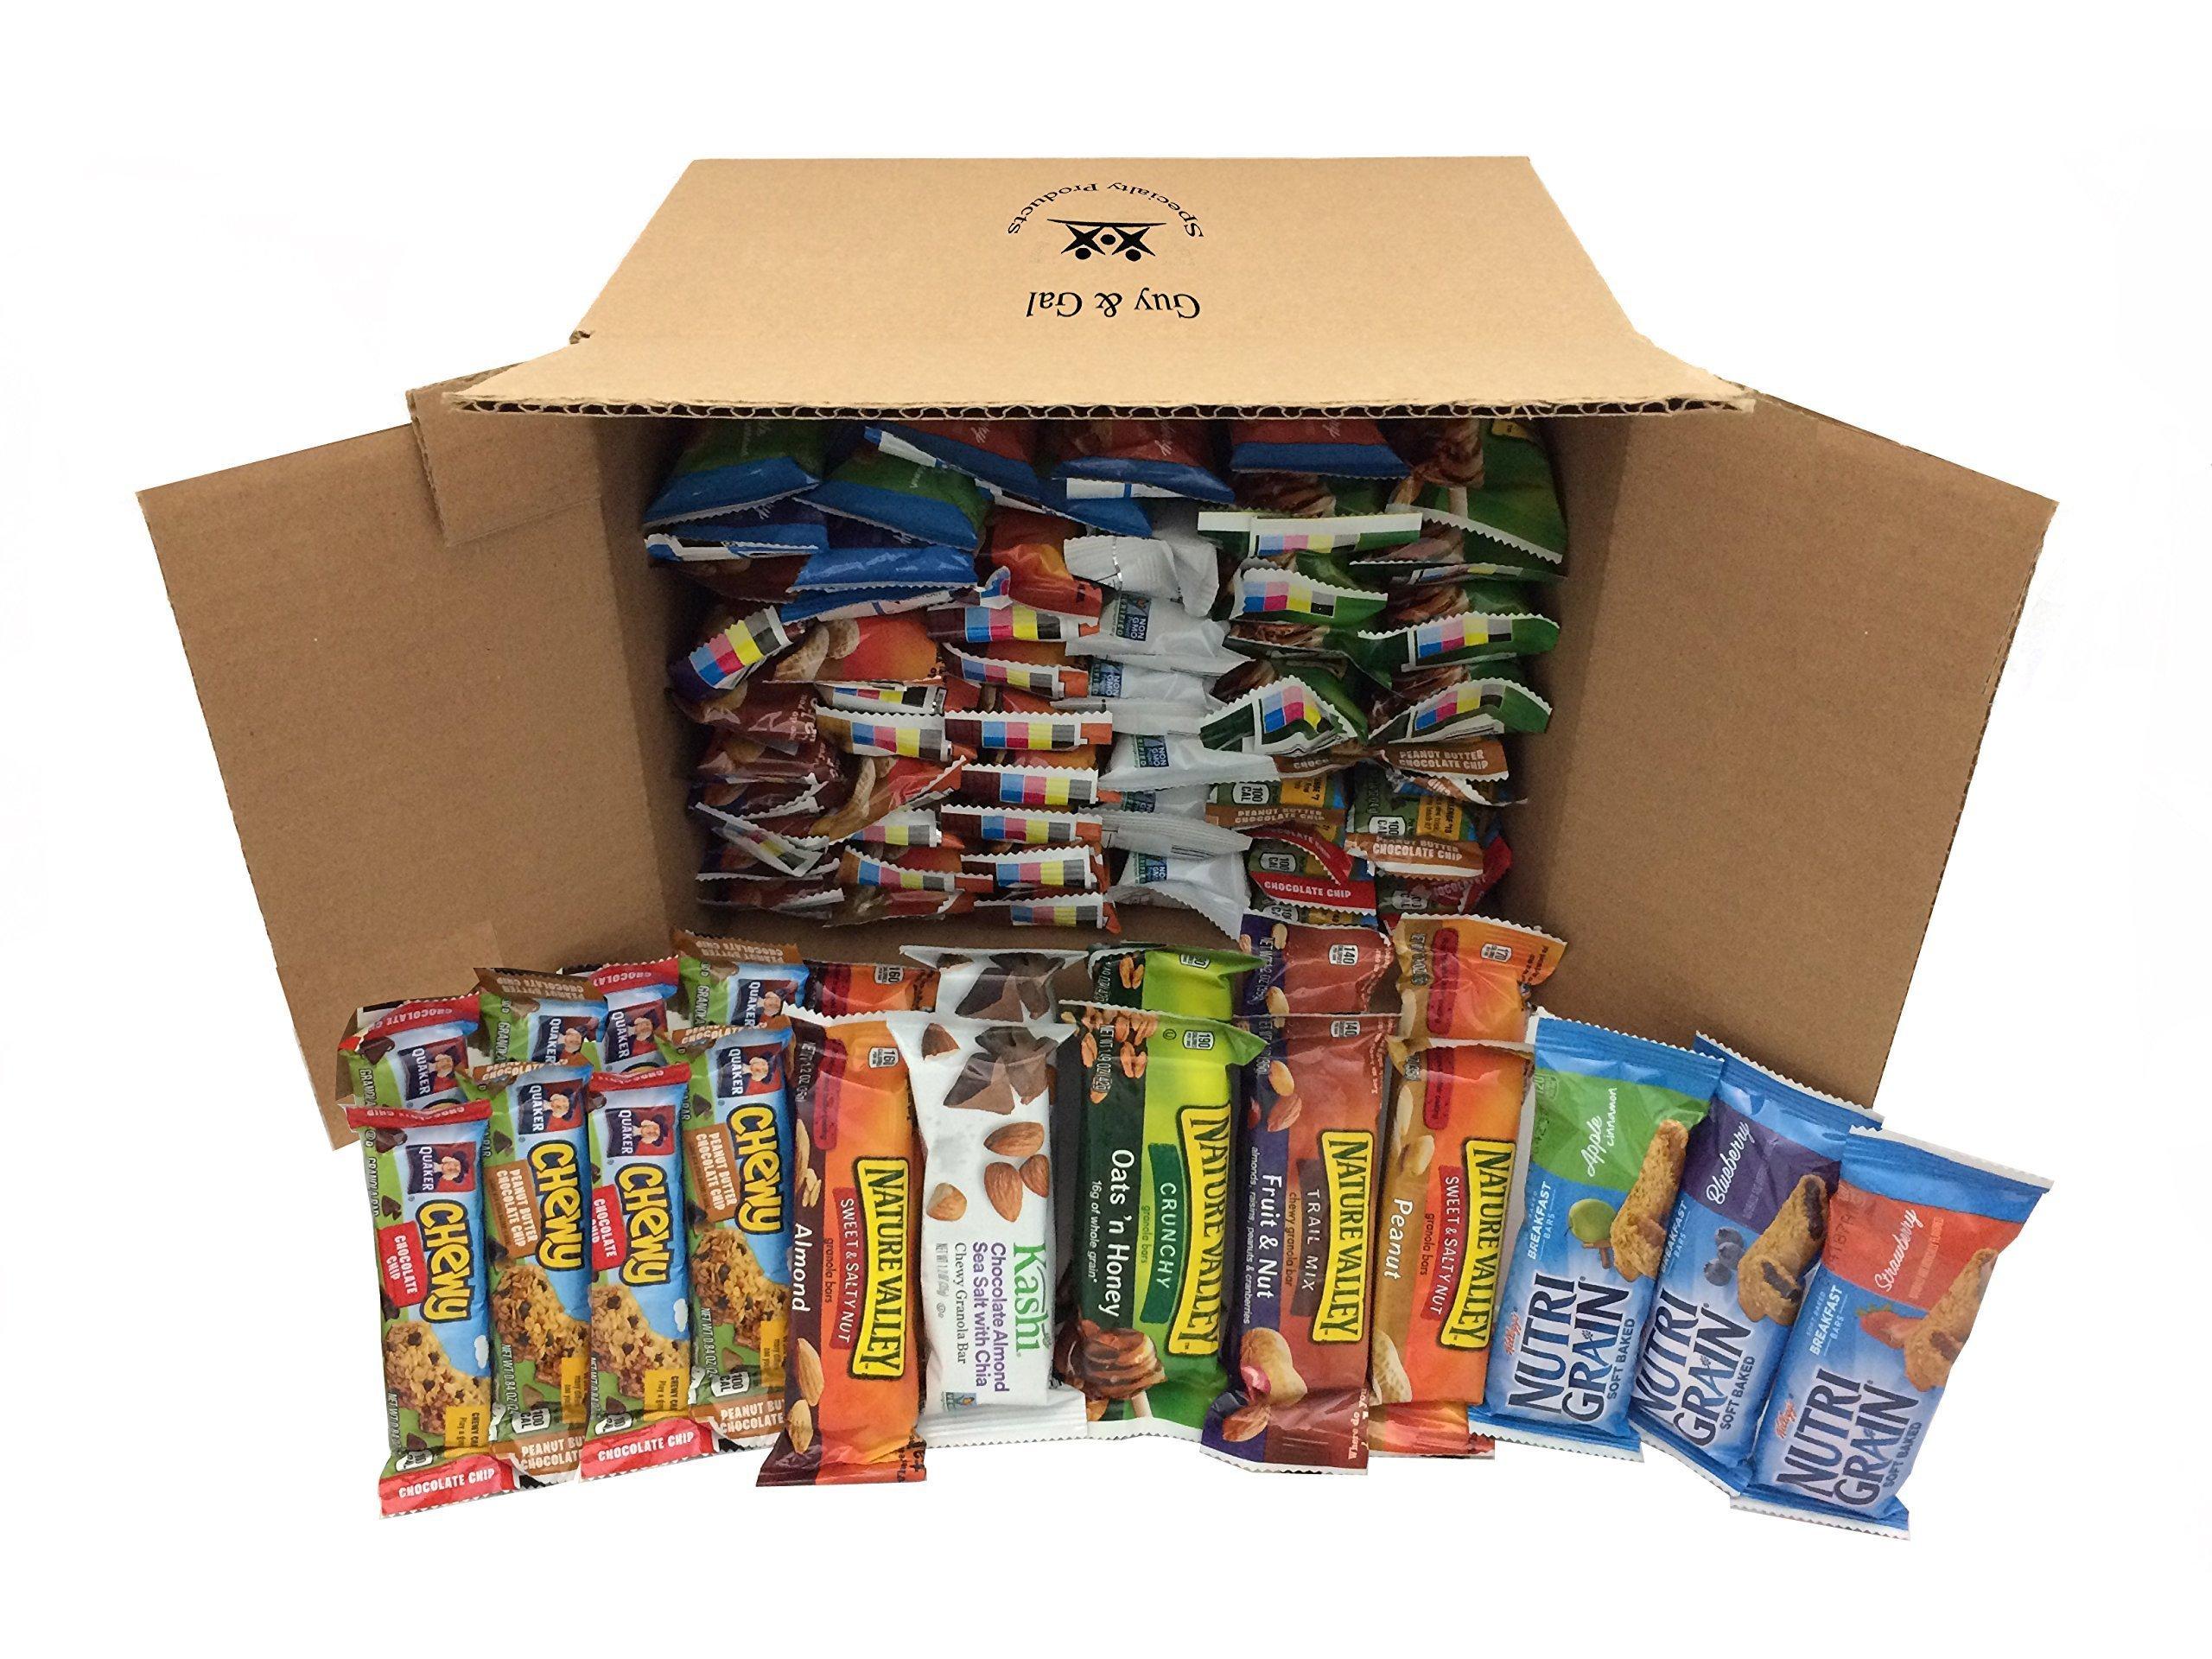 Healthy Bar Snack Mix - Sweet and Salty Granola Bar Variety Pack - Nature Valley, Kashi, Quaker - 72 Bar Bundle